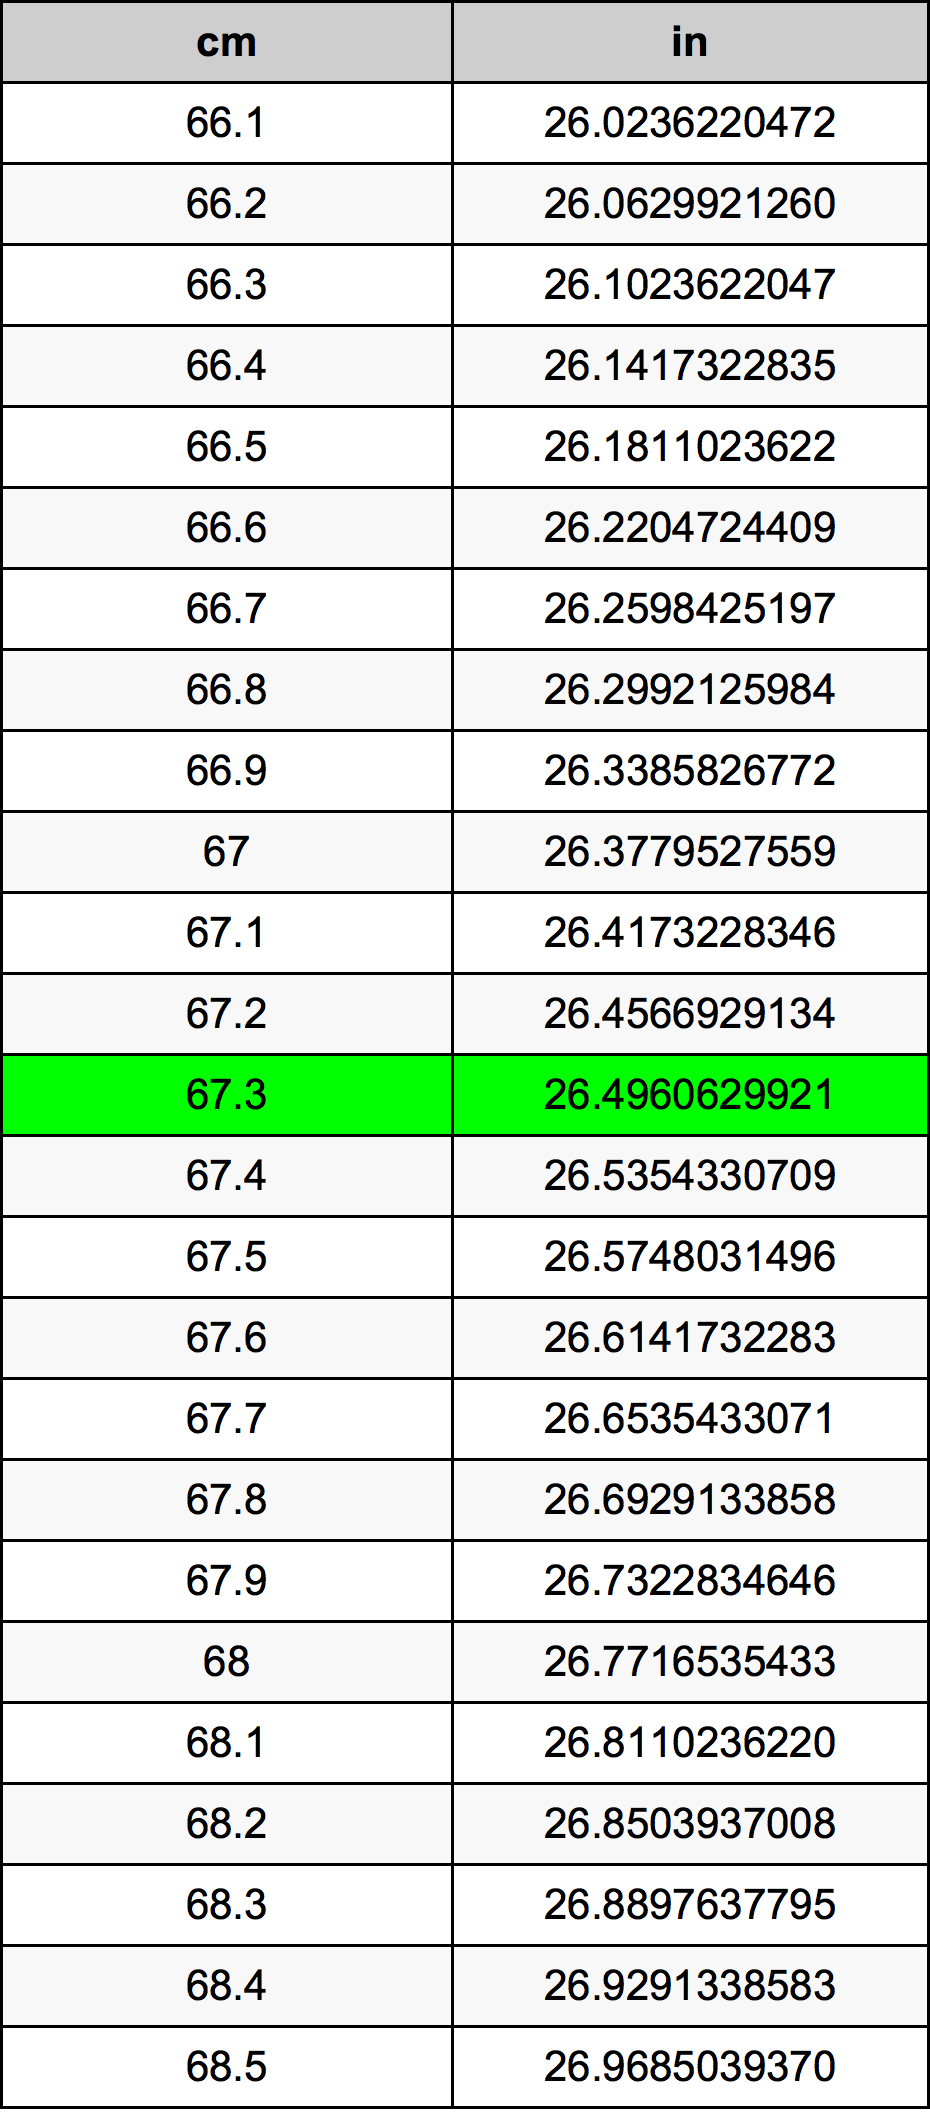 67.3 Centimeter Table